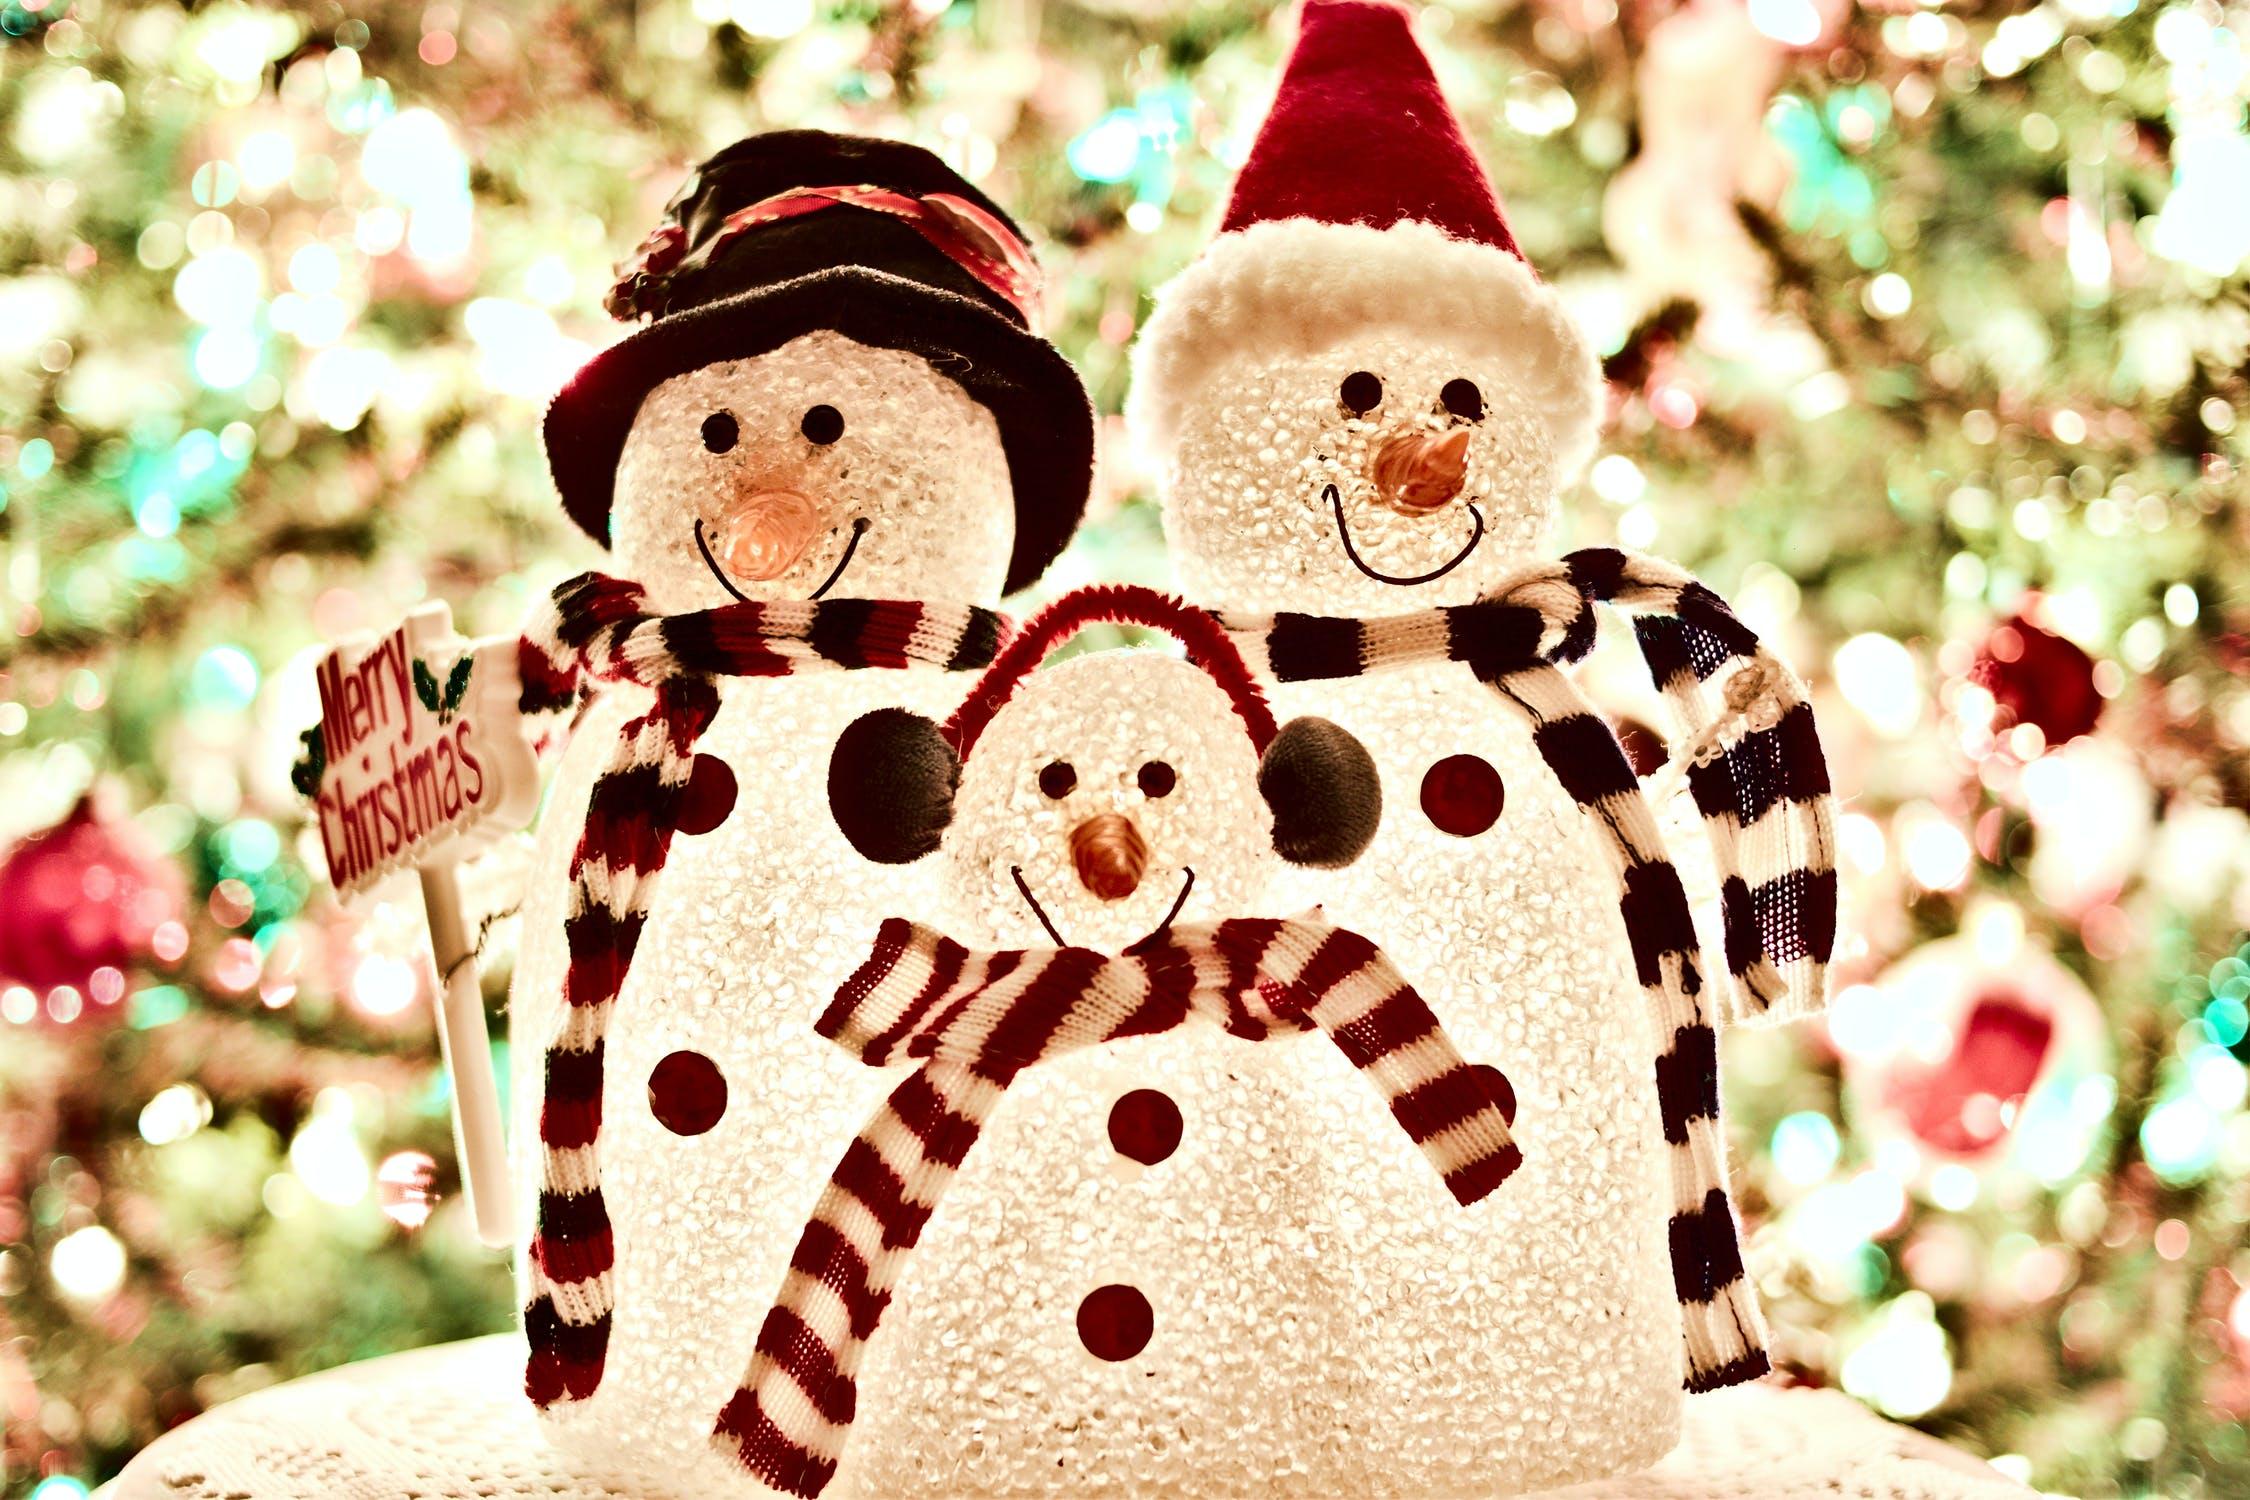 28 Christmas Movies to Watch on Amazon Prime this Holiday Season